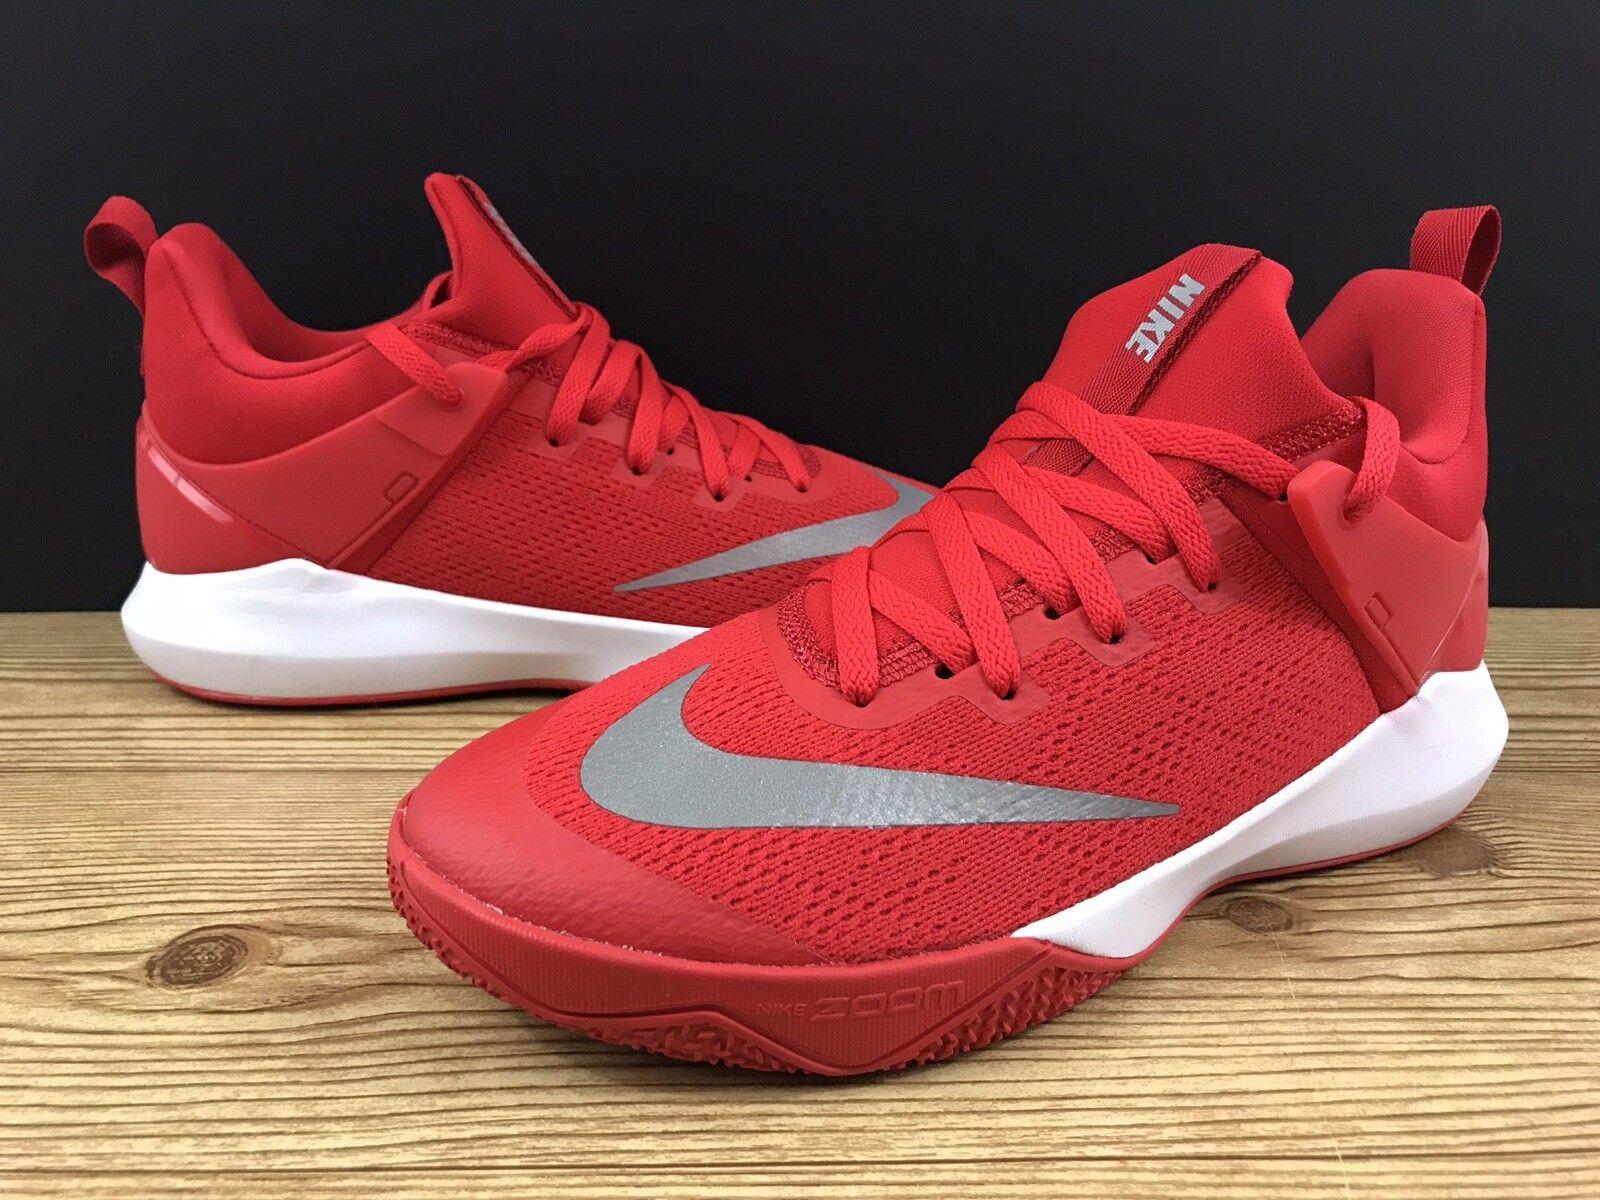 Nike Zoom Shift TB 897811-600 University Red White Men's Basketball shoes Sz 10